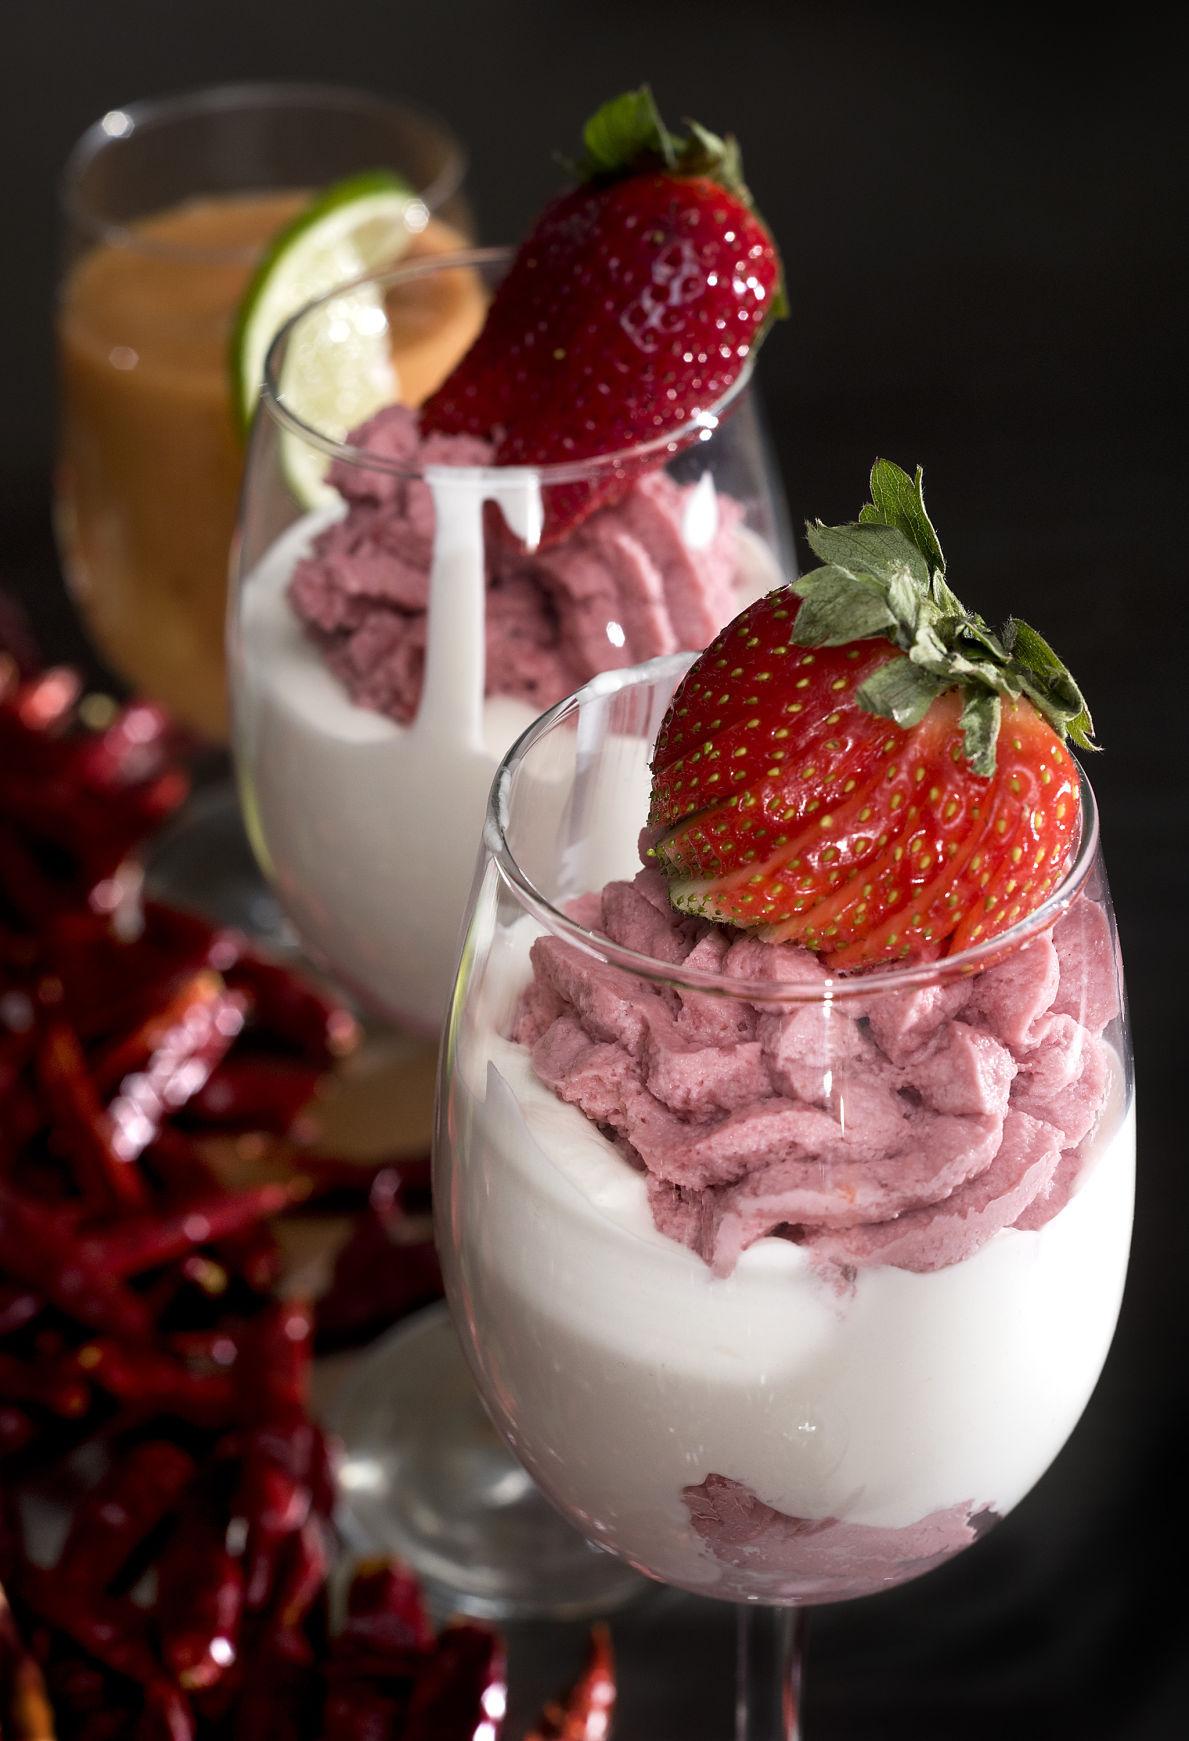 St. Valentine's Day foods